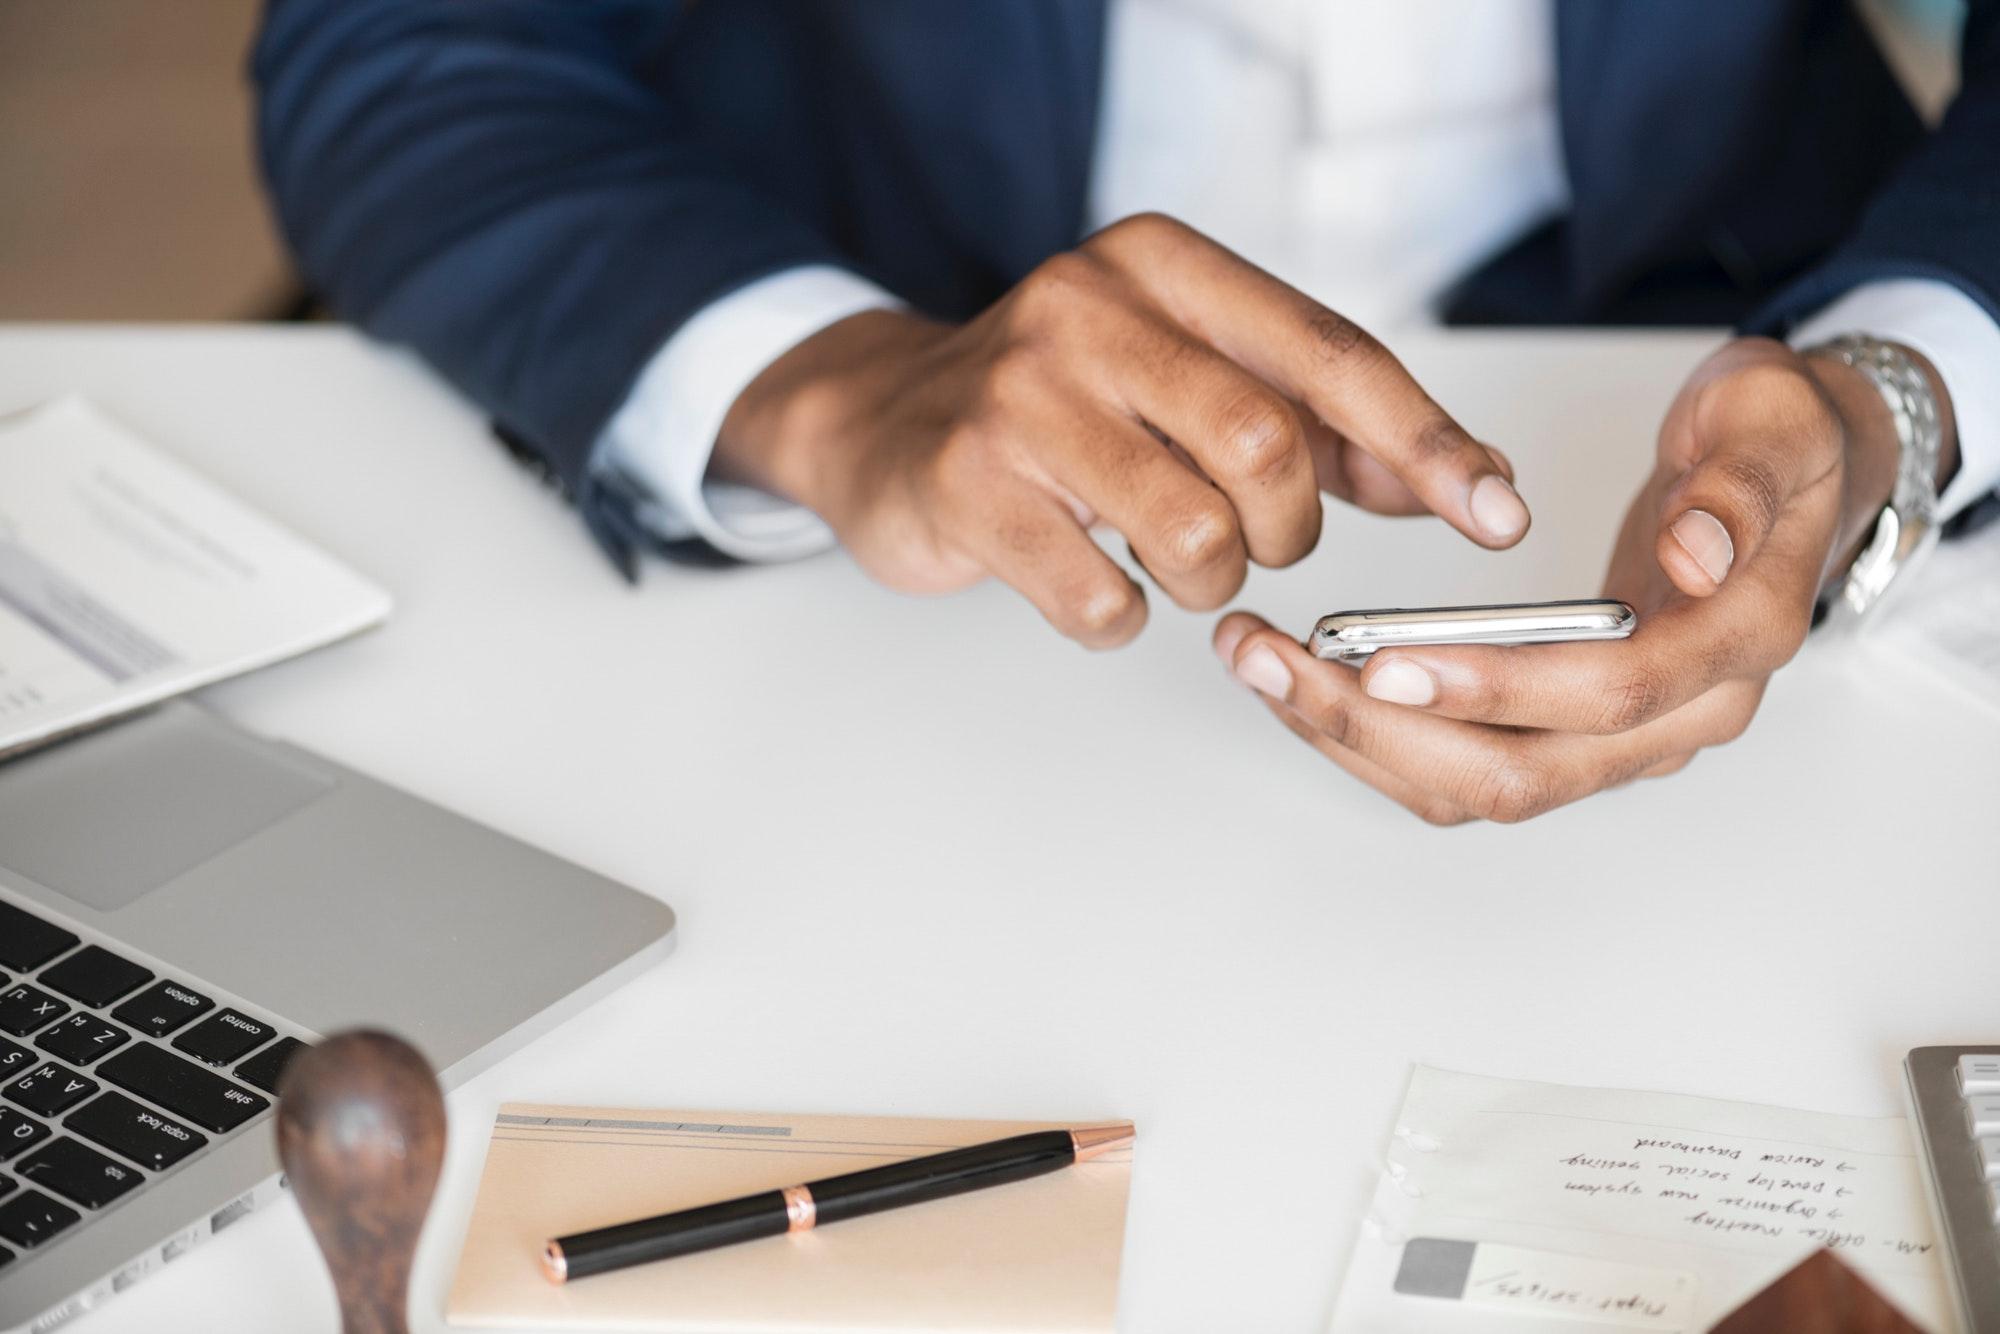 marketing agency in preston for personal finance